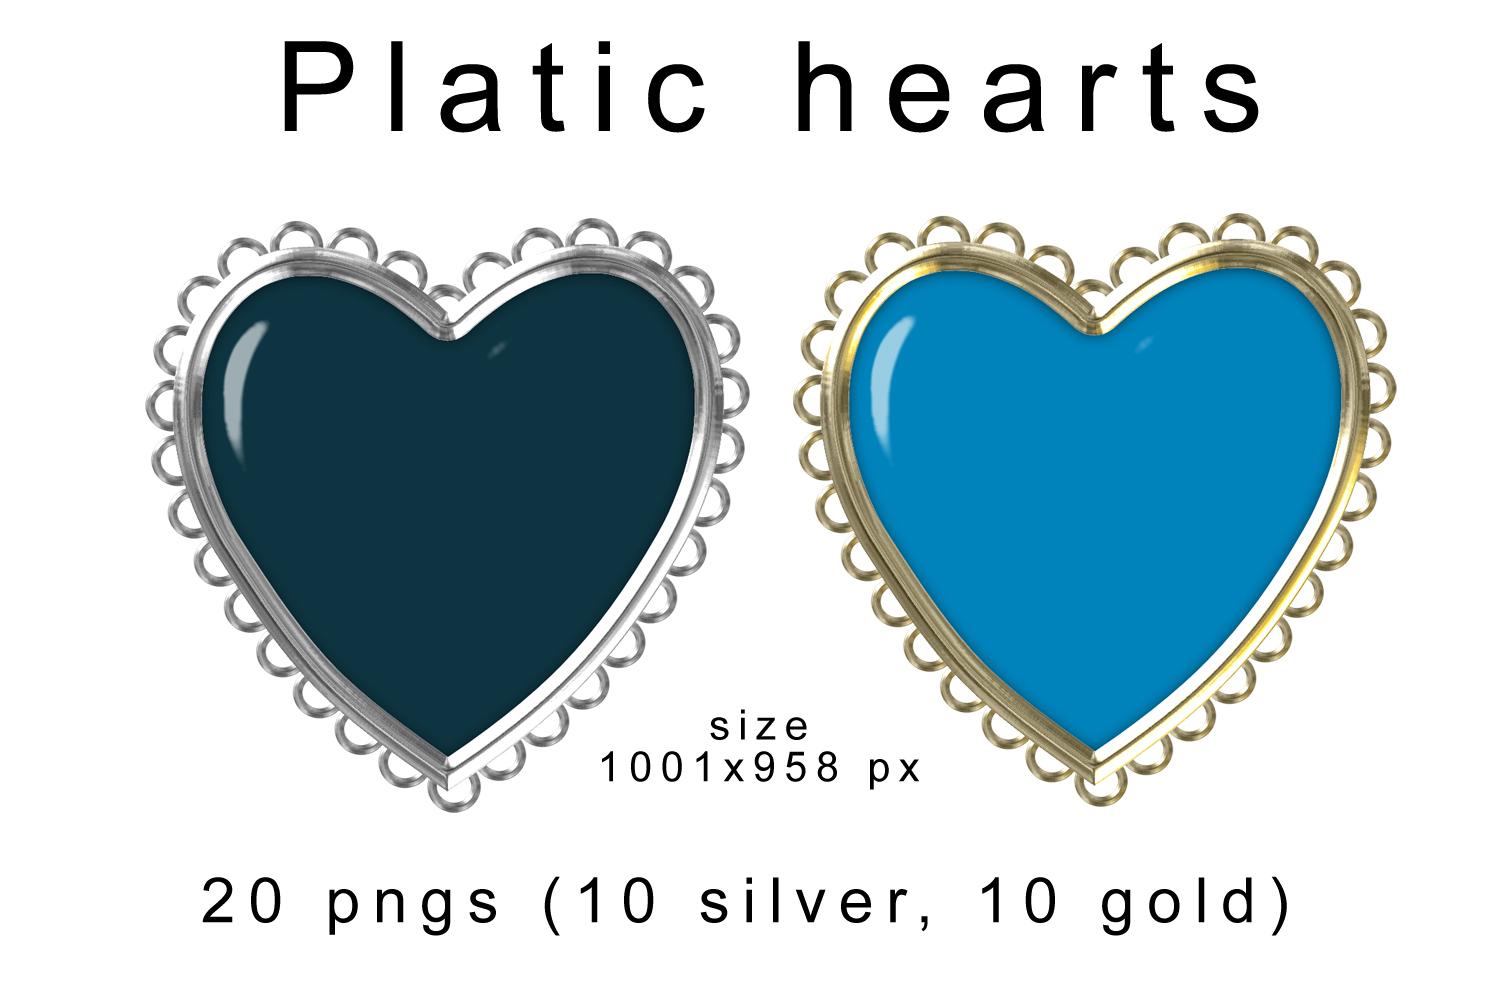 Plastic hearts scrapbooking elements example image 1